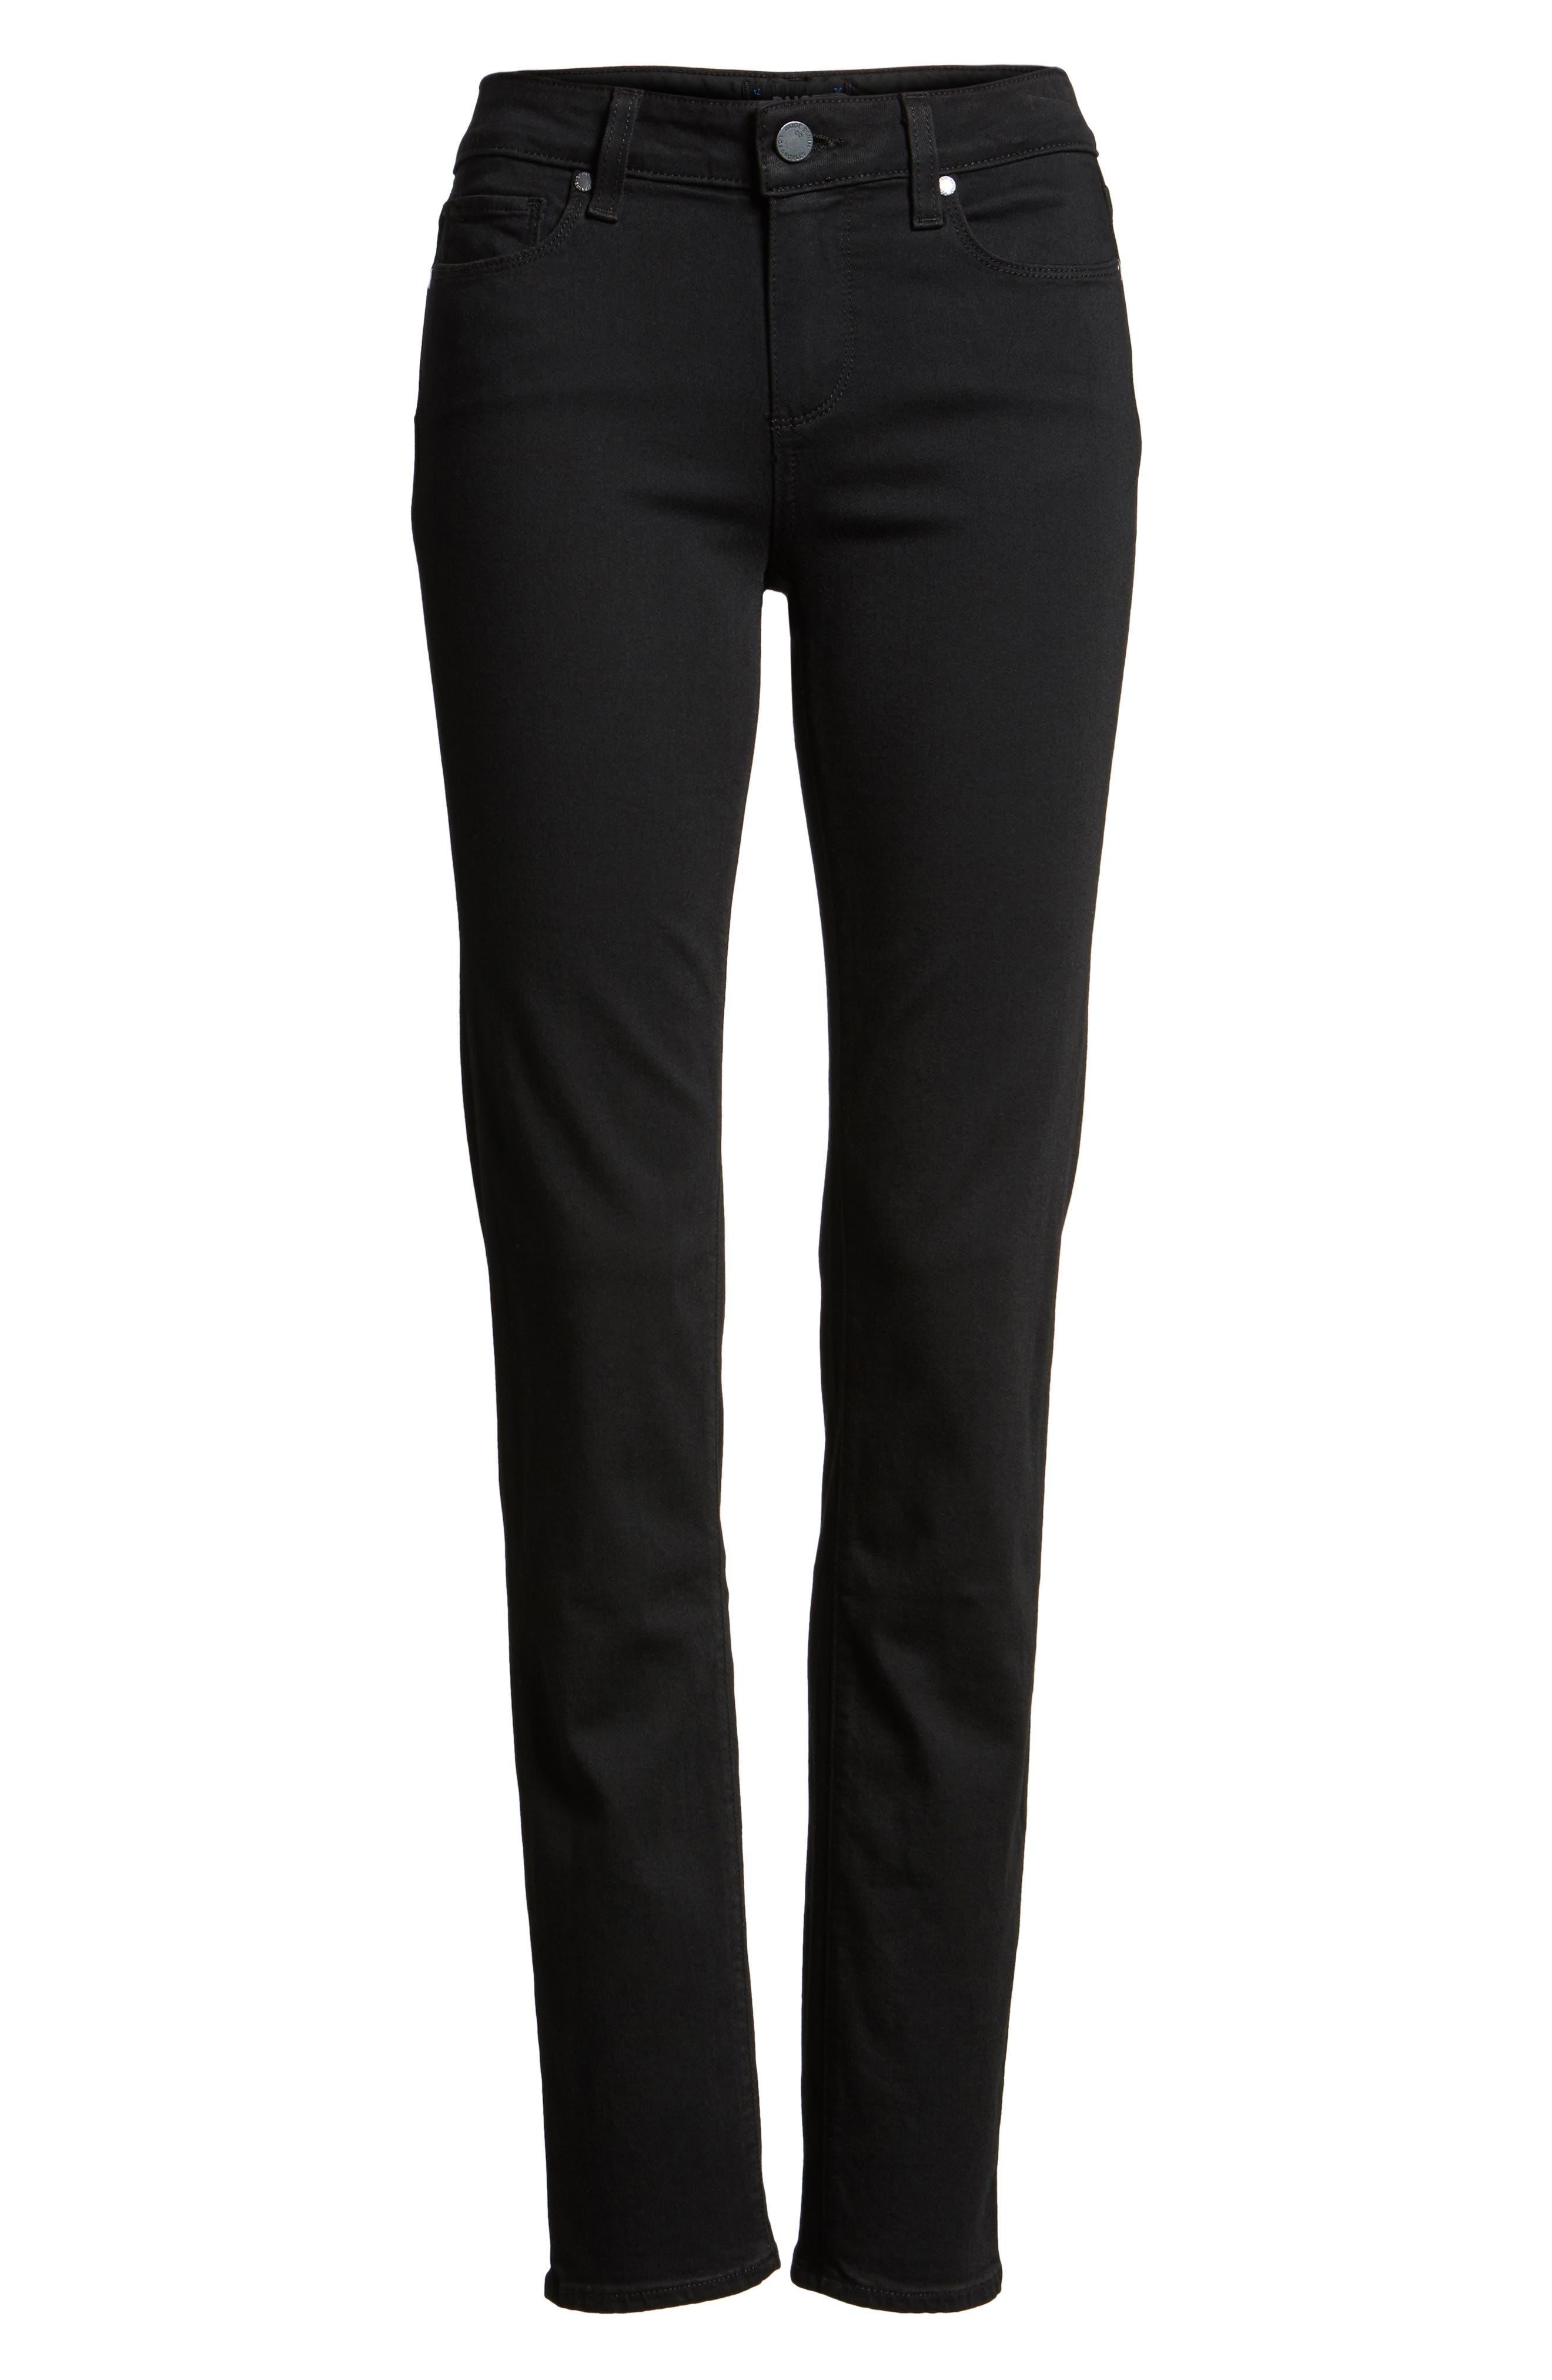 Transcend - Skyline Skinny Jeans,                             Alternate thumbnail 8, color,                             BLACK SHADOW